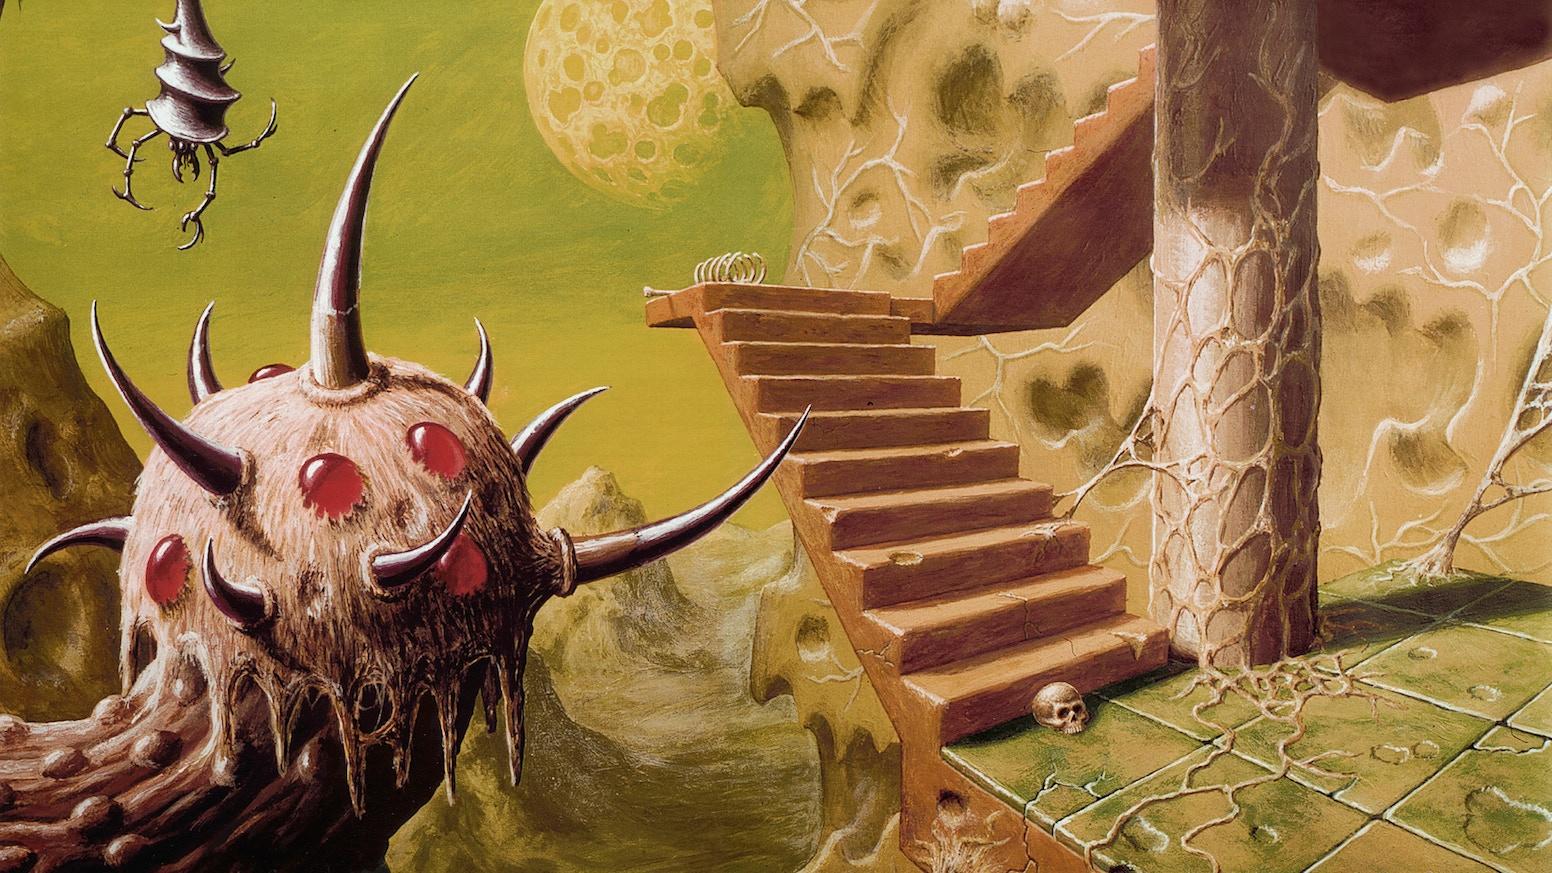 Trinity of Awesome Returns! by Venger Satanis — Kickstarter